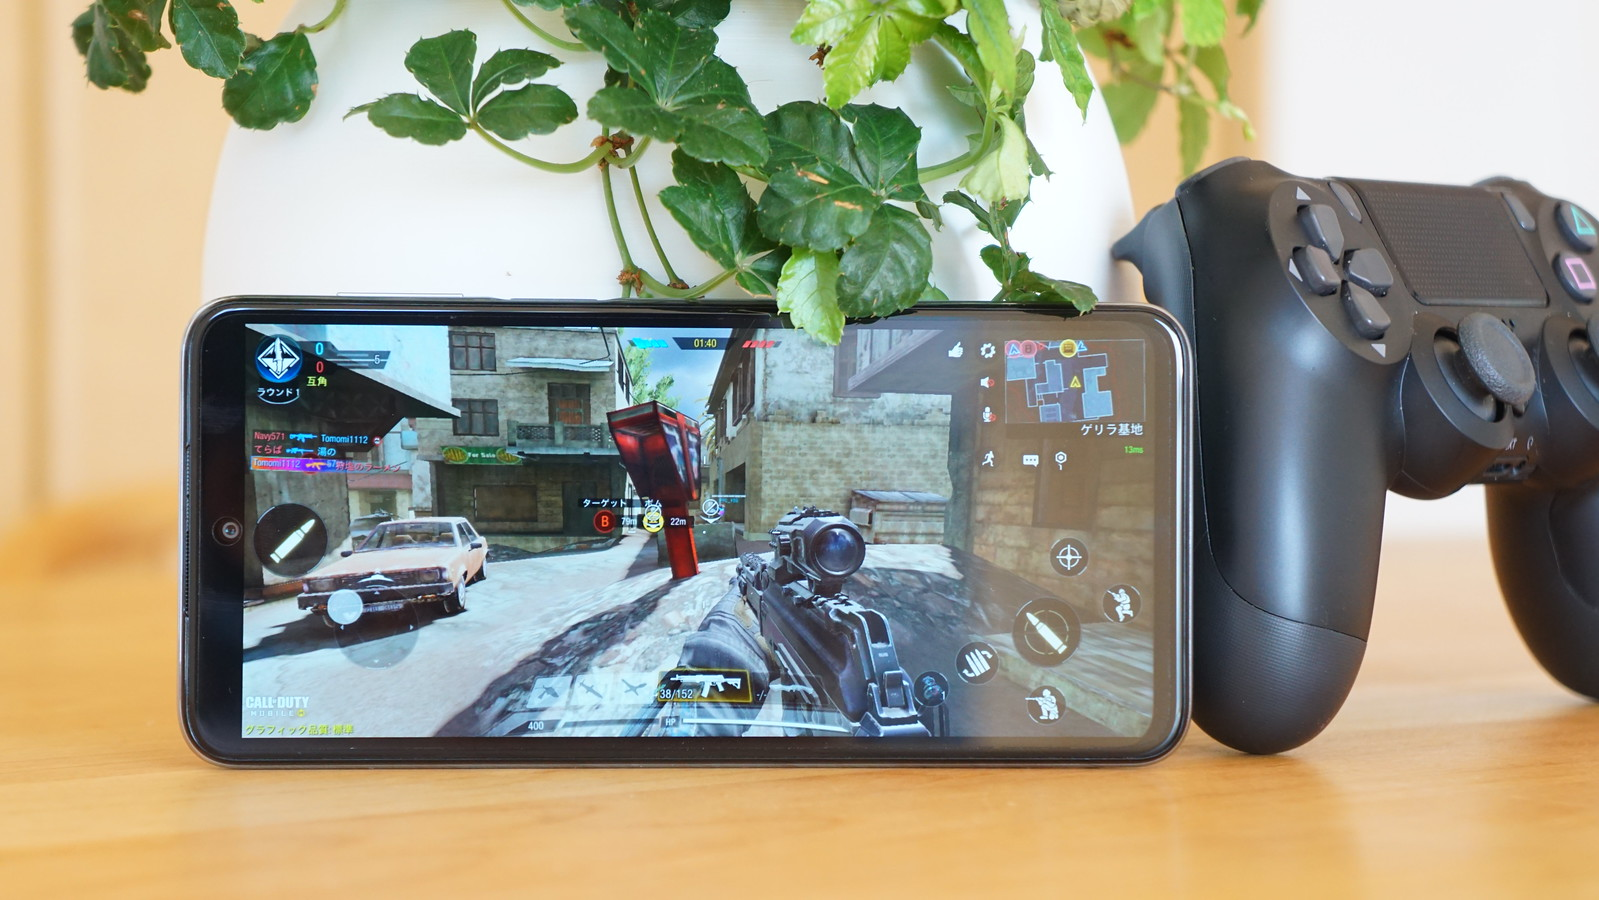 Redmi Note 9S レビュー - ゲーマー向けのプロセッサと大容量バッテリー